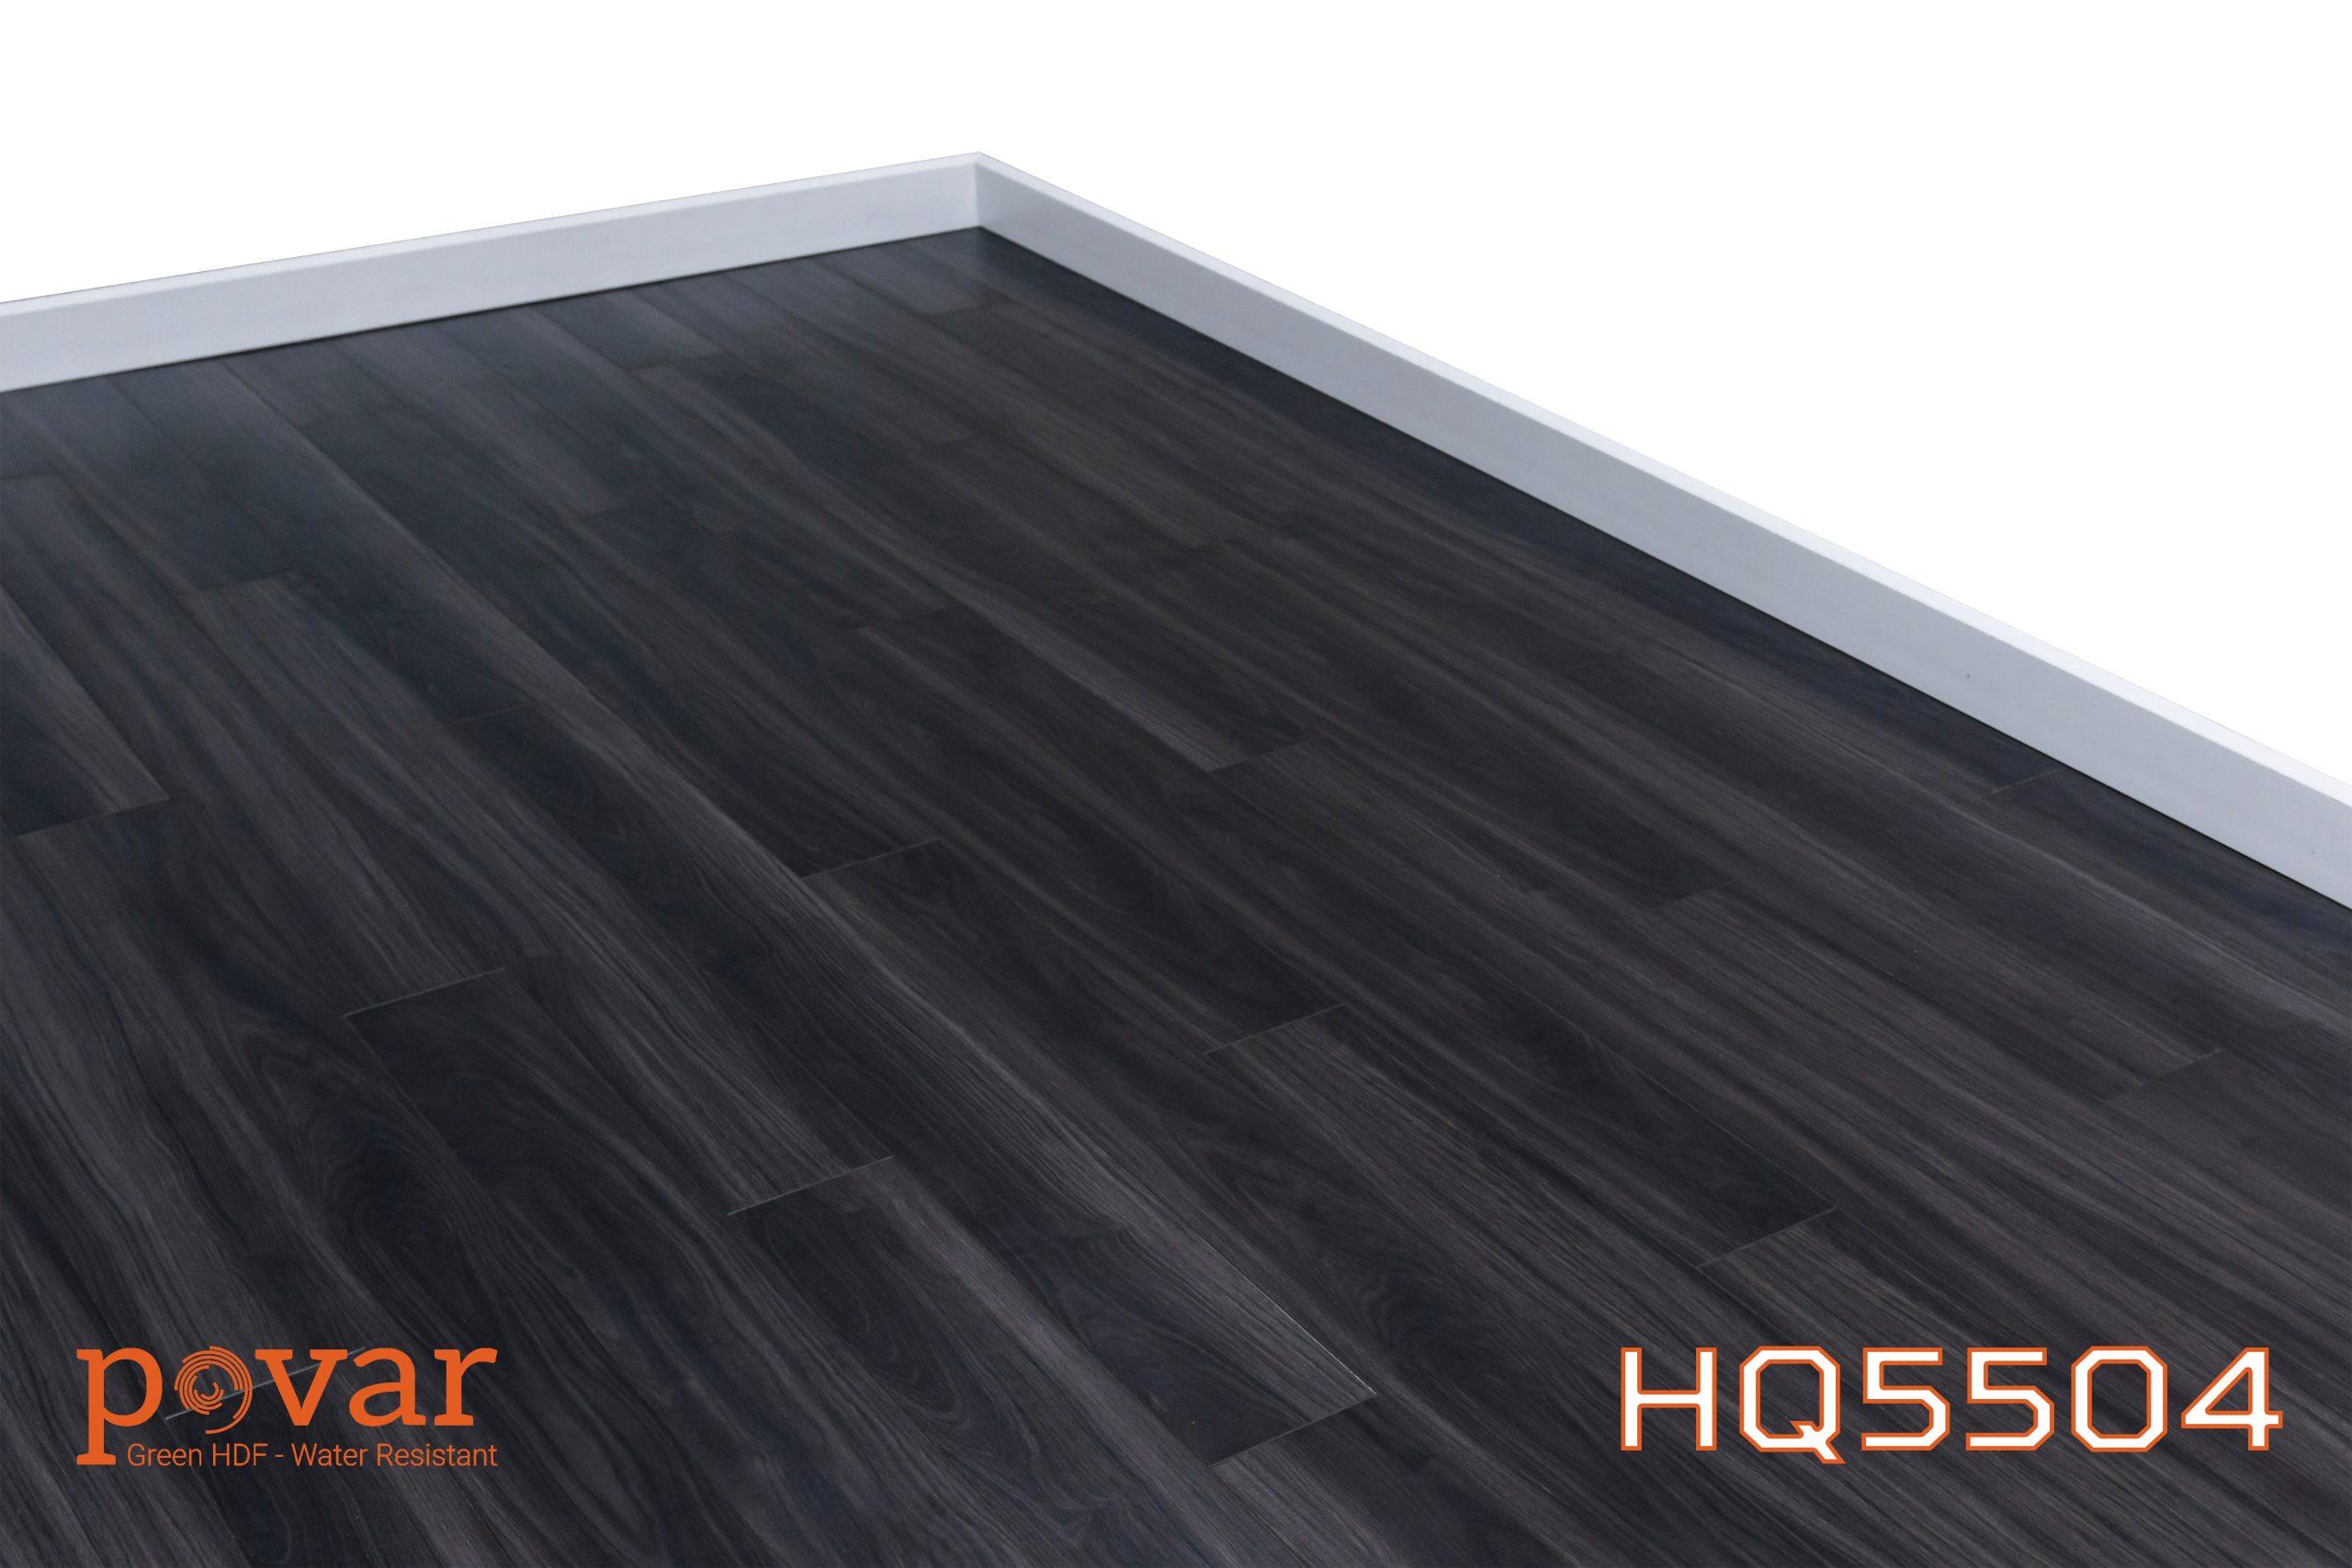 Sàn gỗ Povar HQ5504